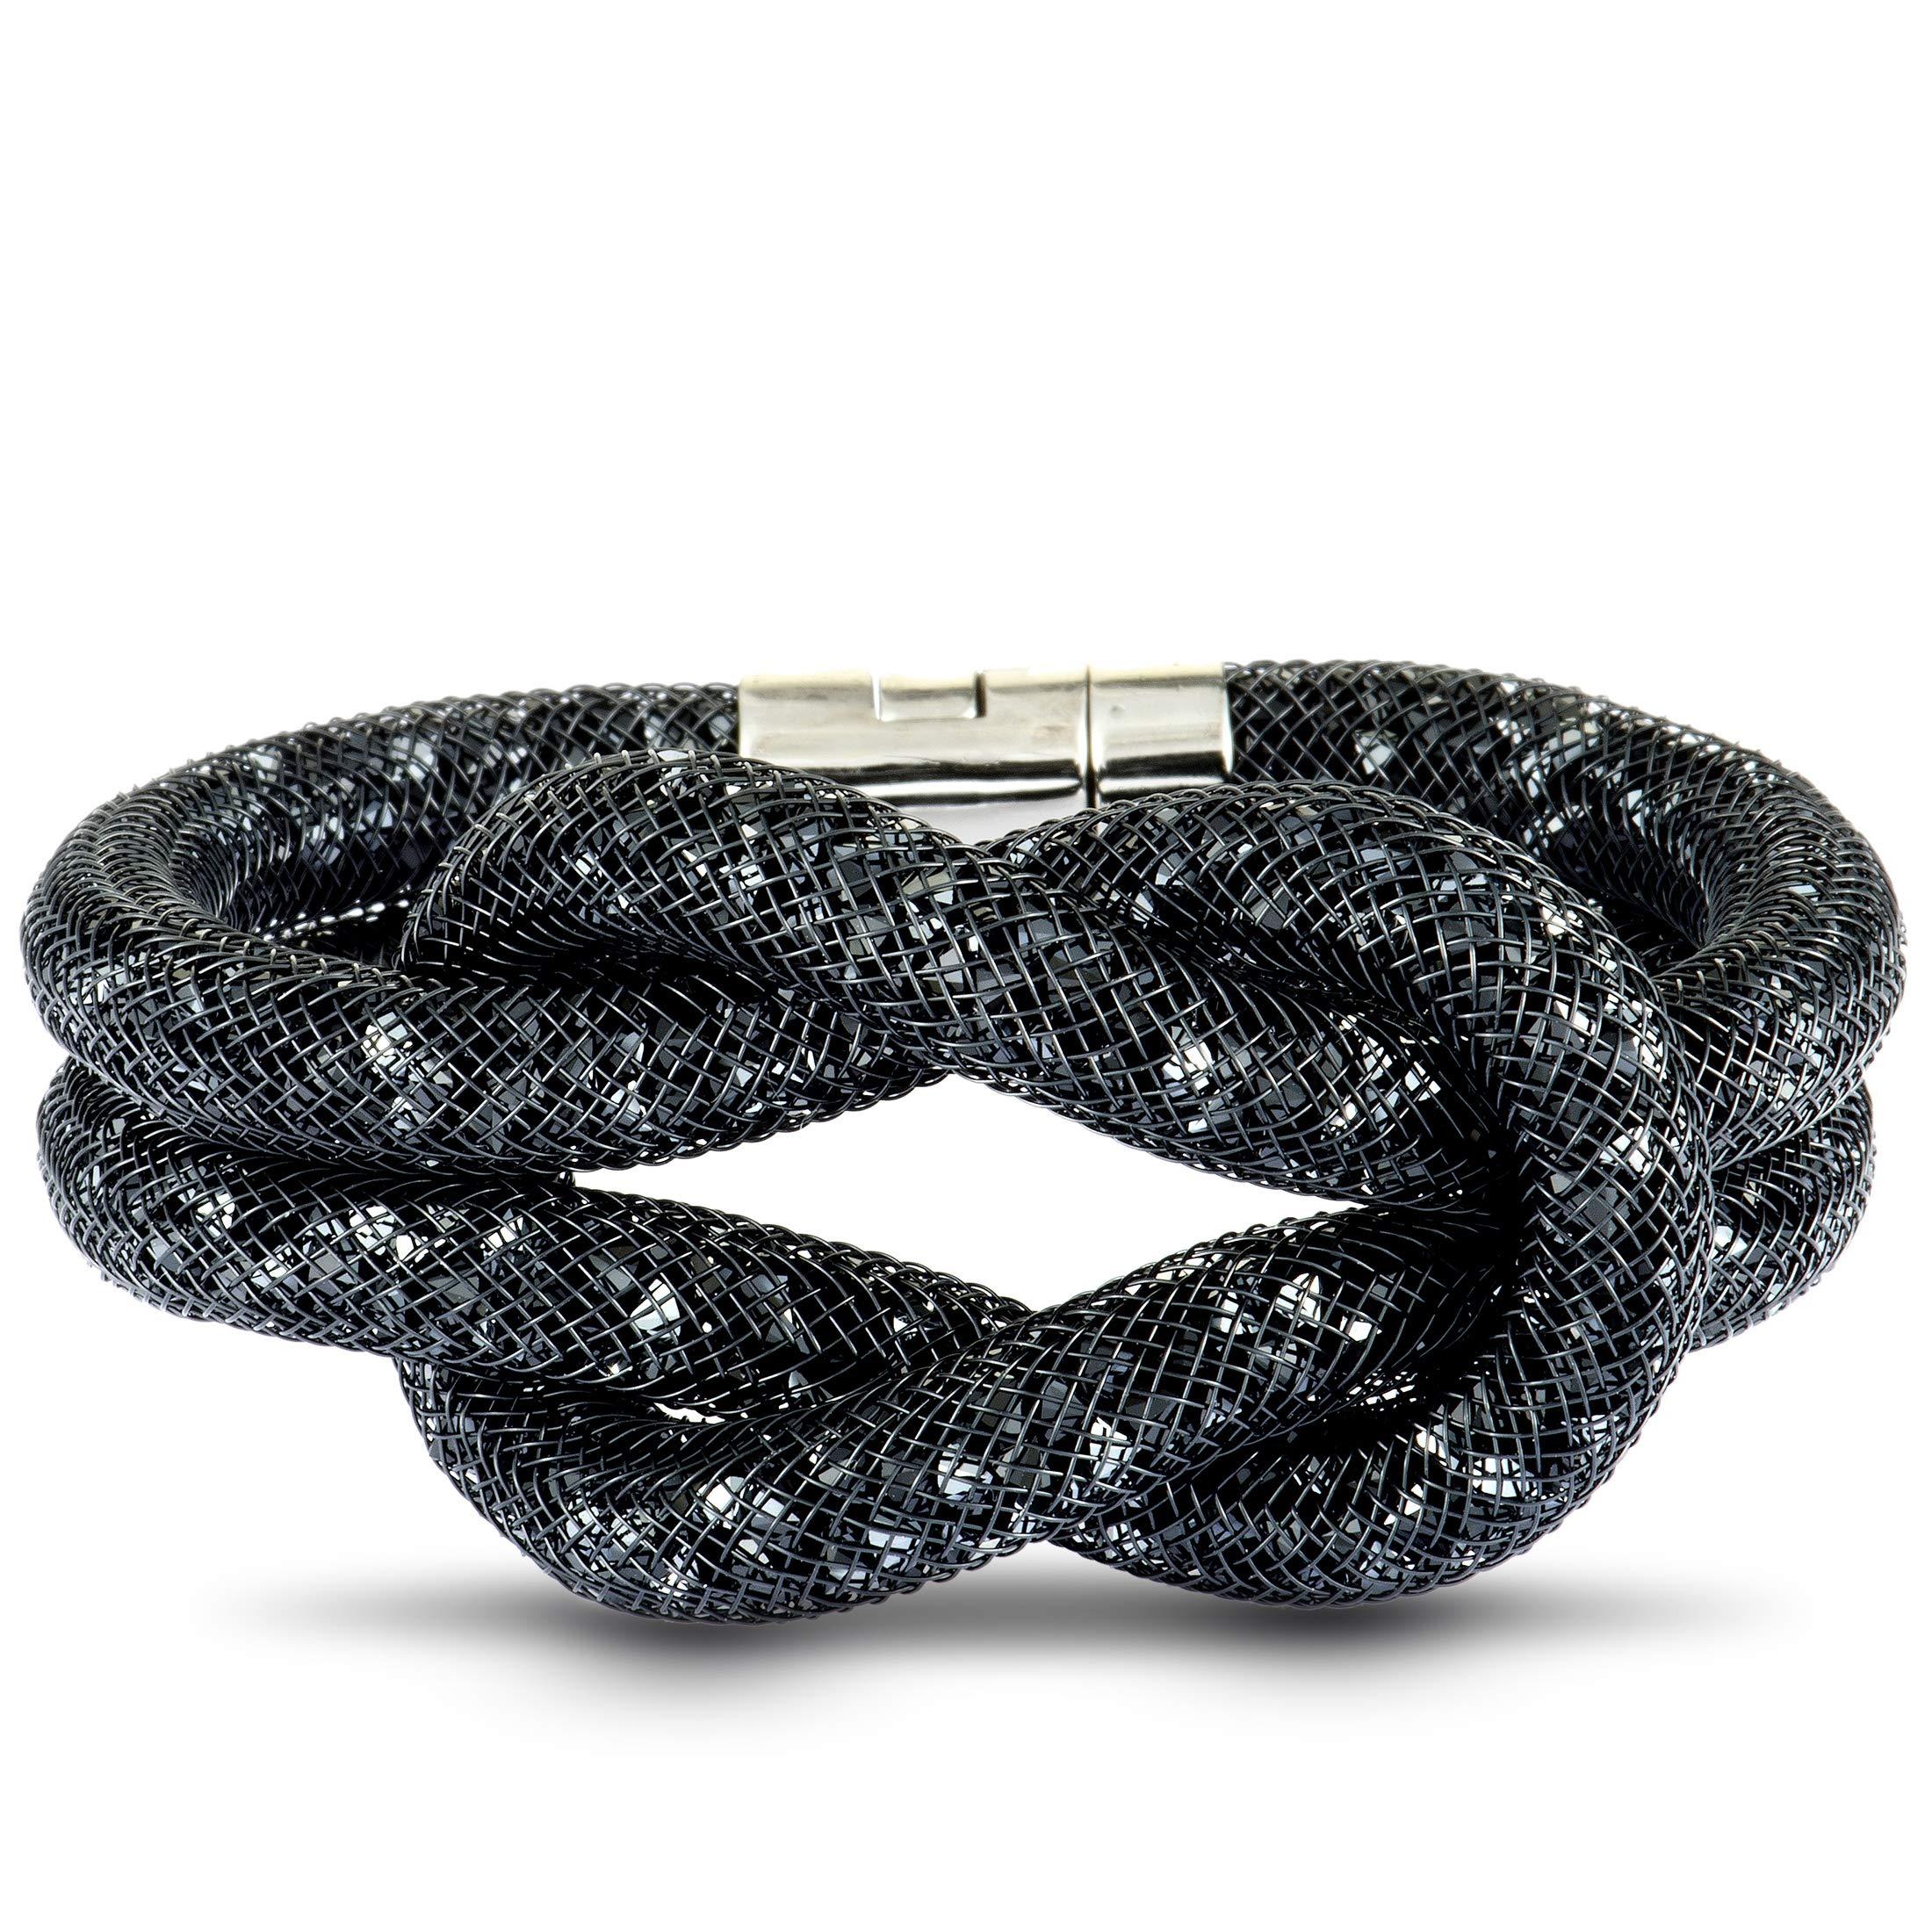 Swarovski Stardust Knot Bracelet, S by SWAROVSKI